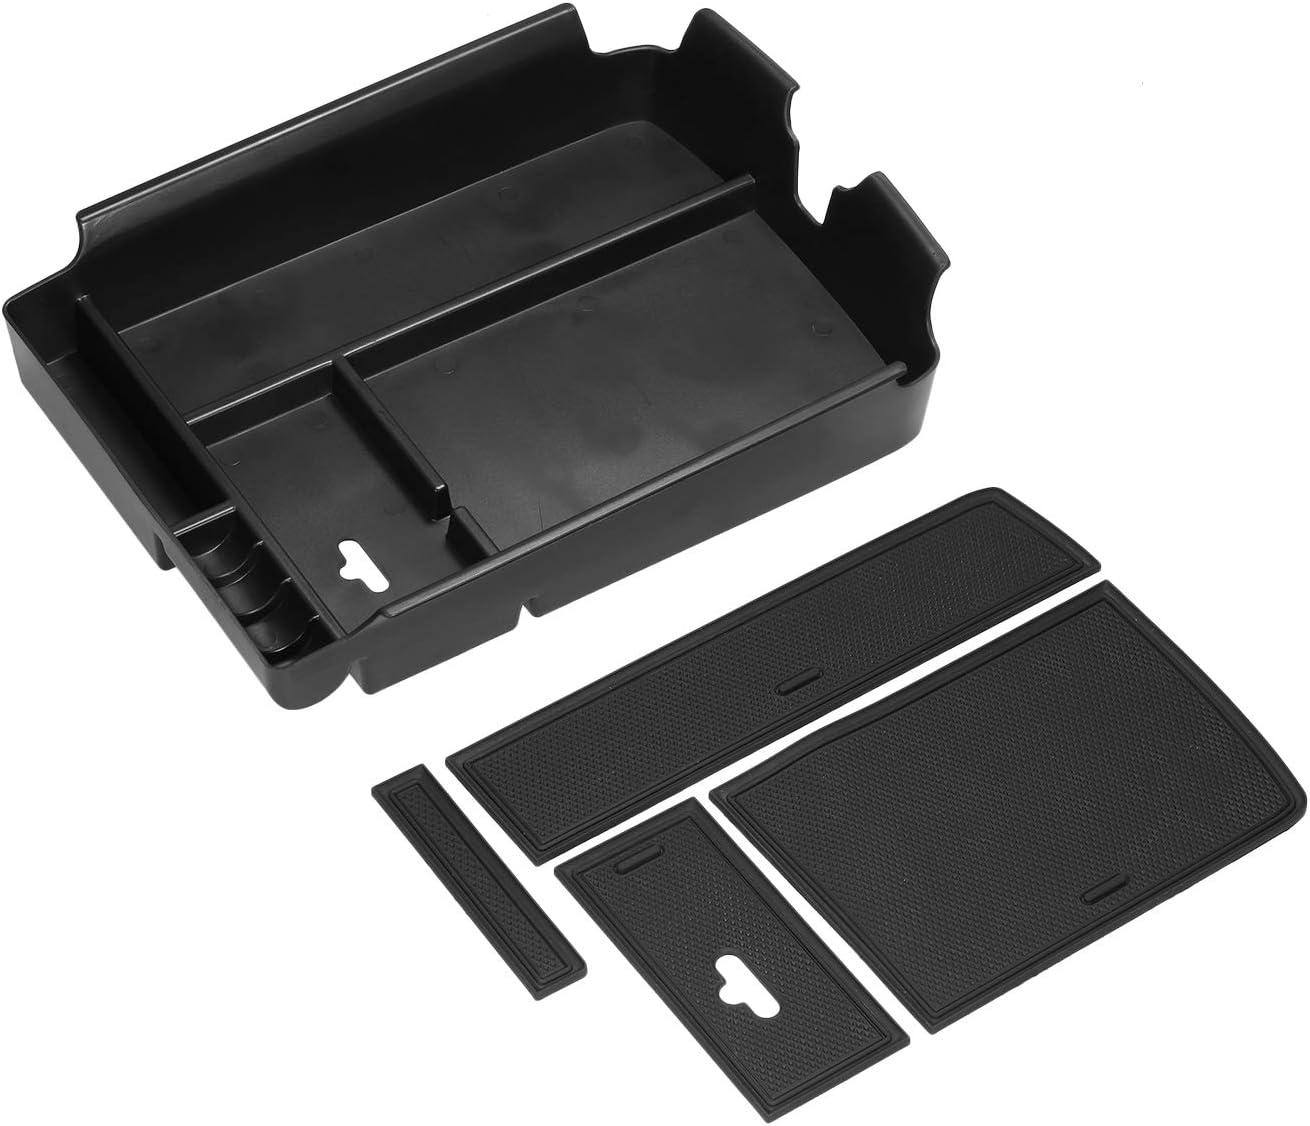 Festnight Center Console Organizer Armrest Storage Box Compatible with VW Volkswagen Atlas 2016-2019